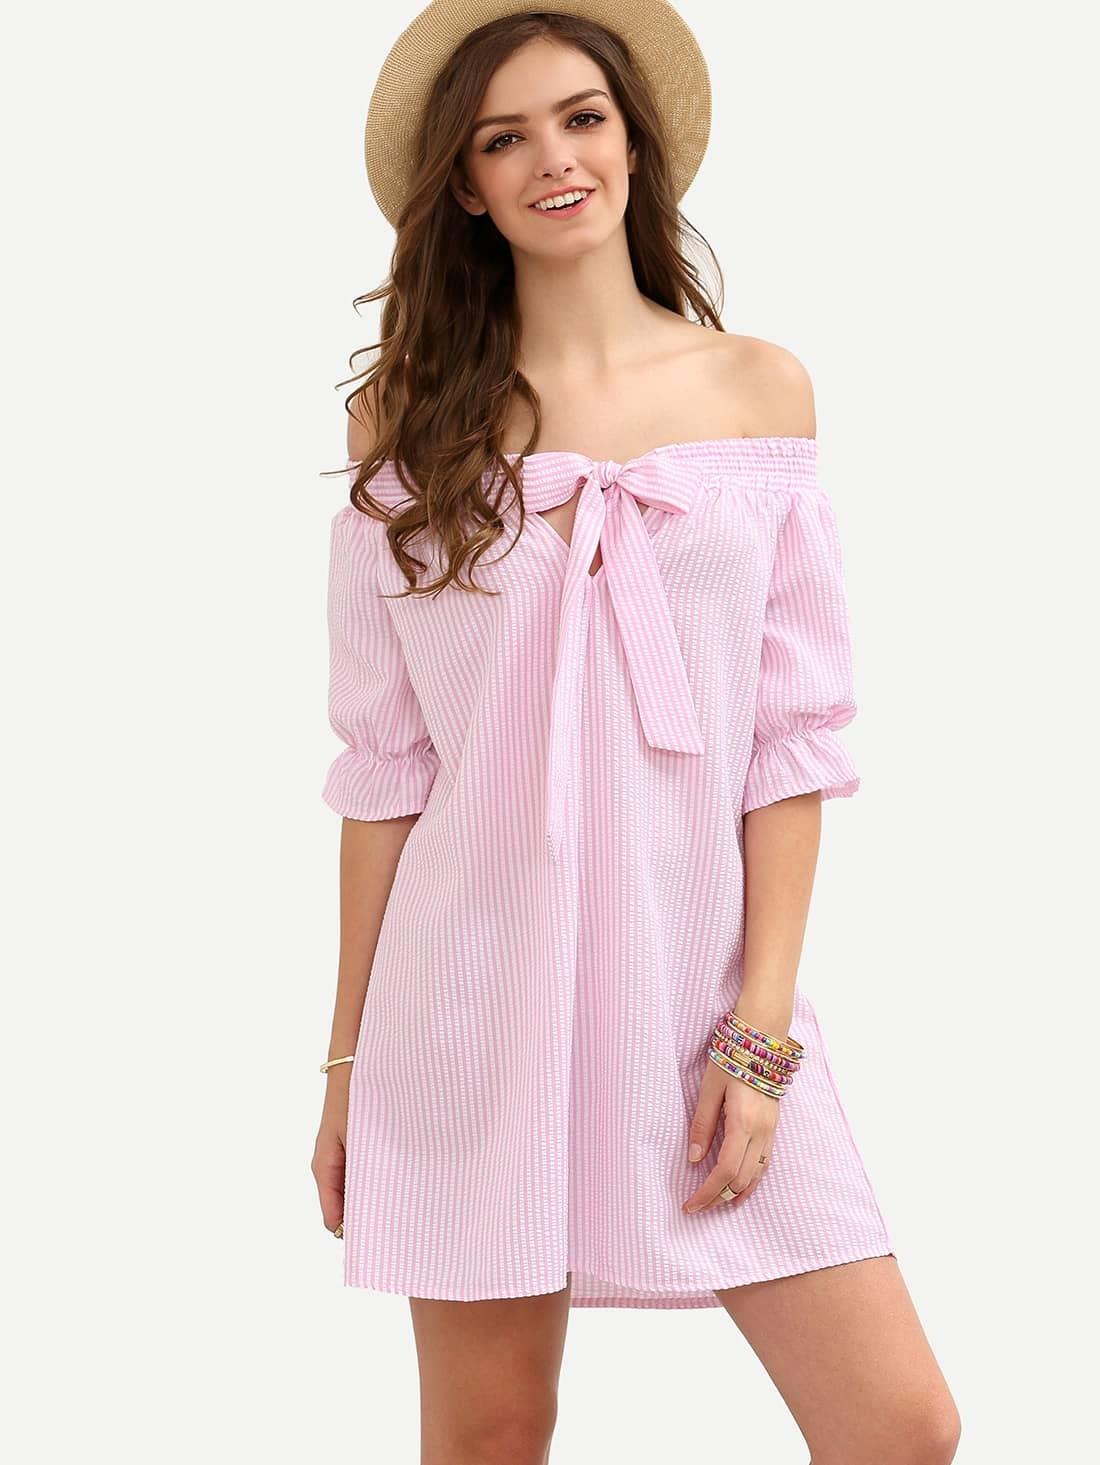 Pink Striped Bow Off The Shoulder Shift Dress dress160602528